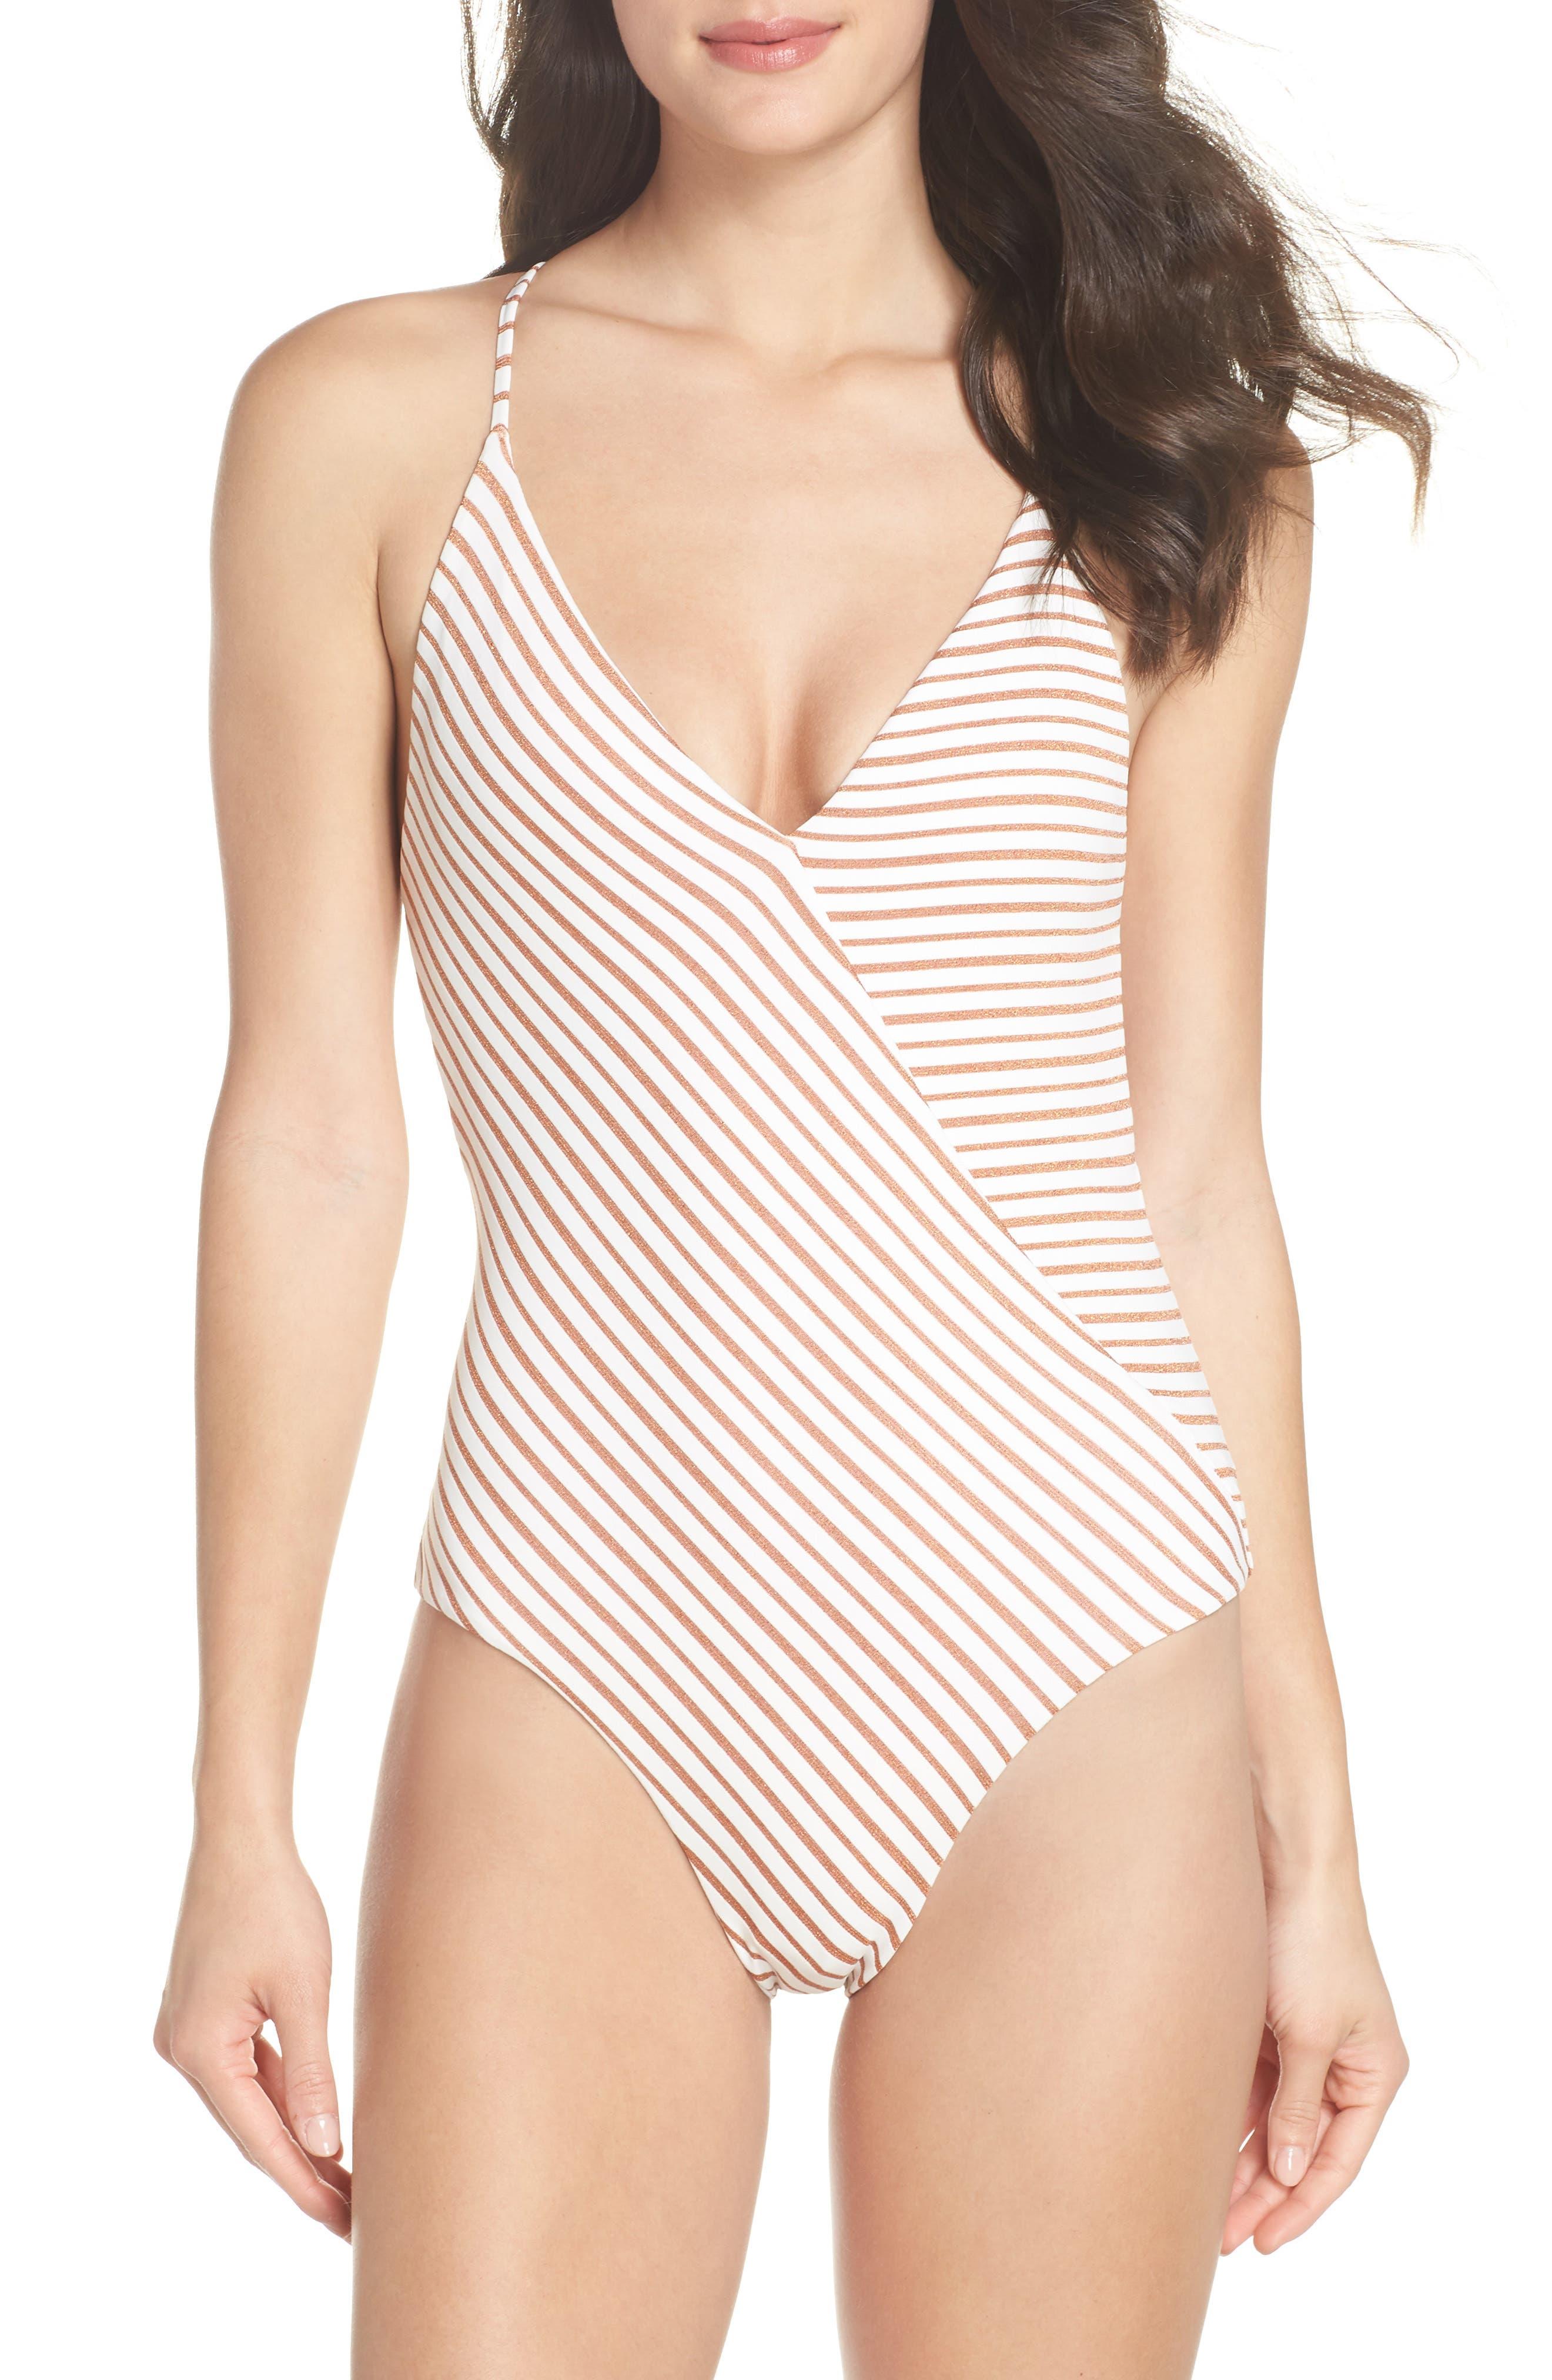 Blair One-Piece Swimsuit,                             Main thumbnail 1, color,                             White